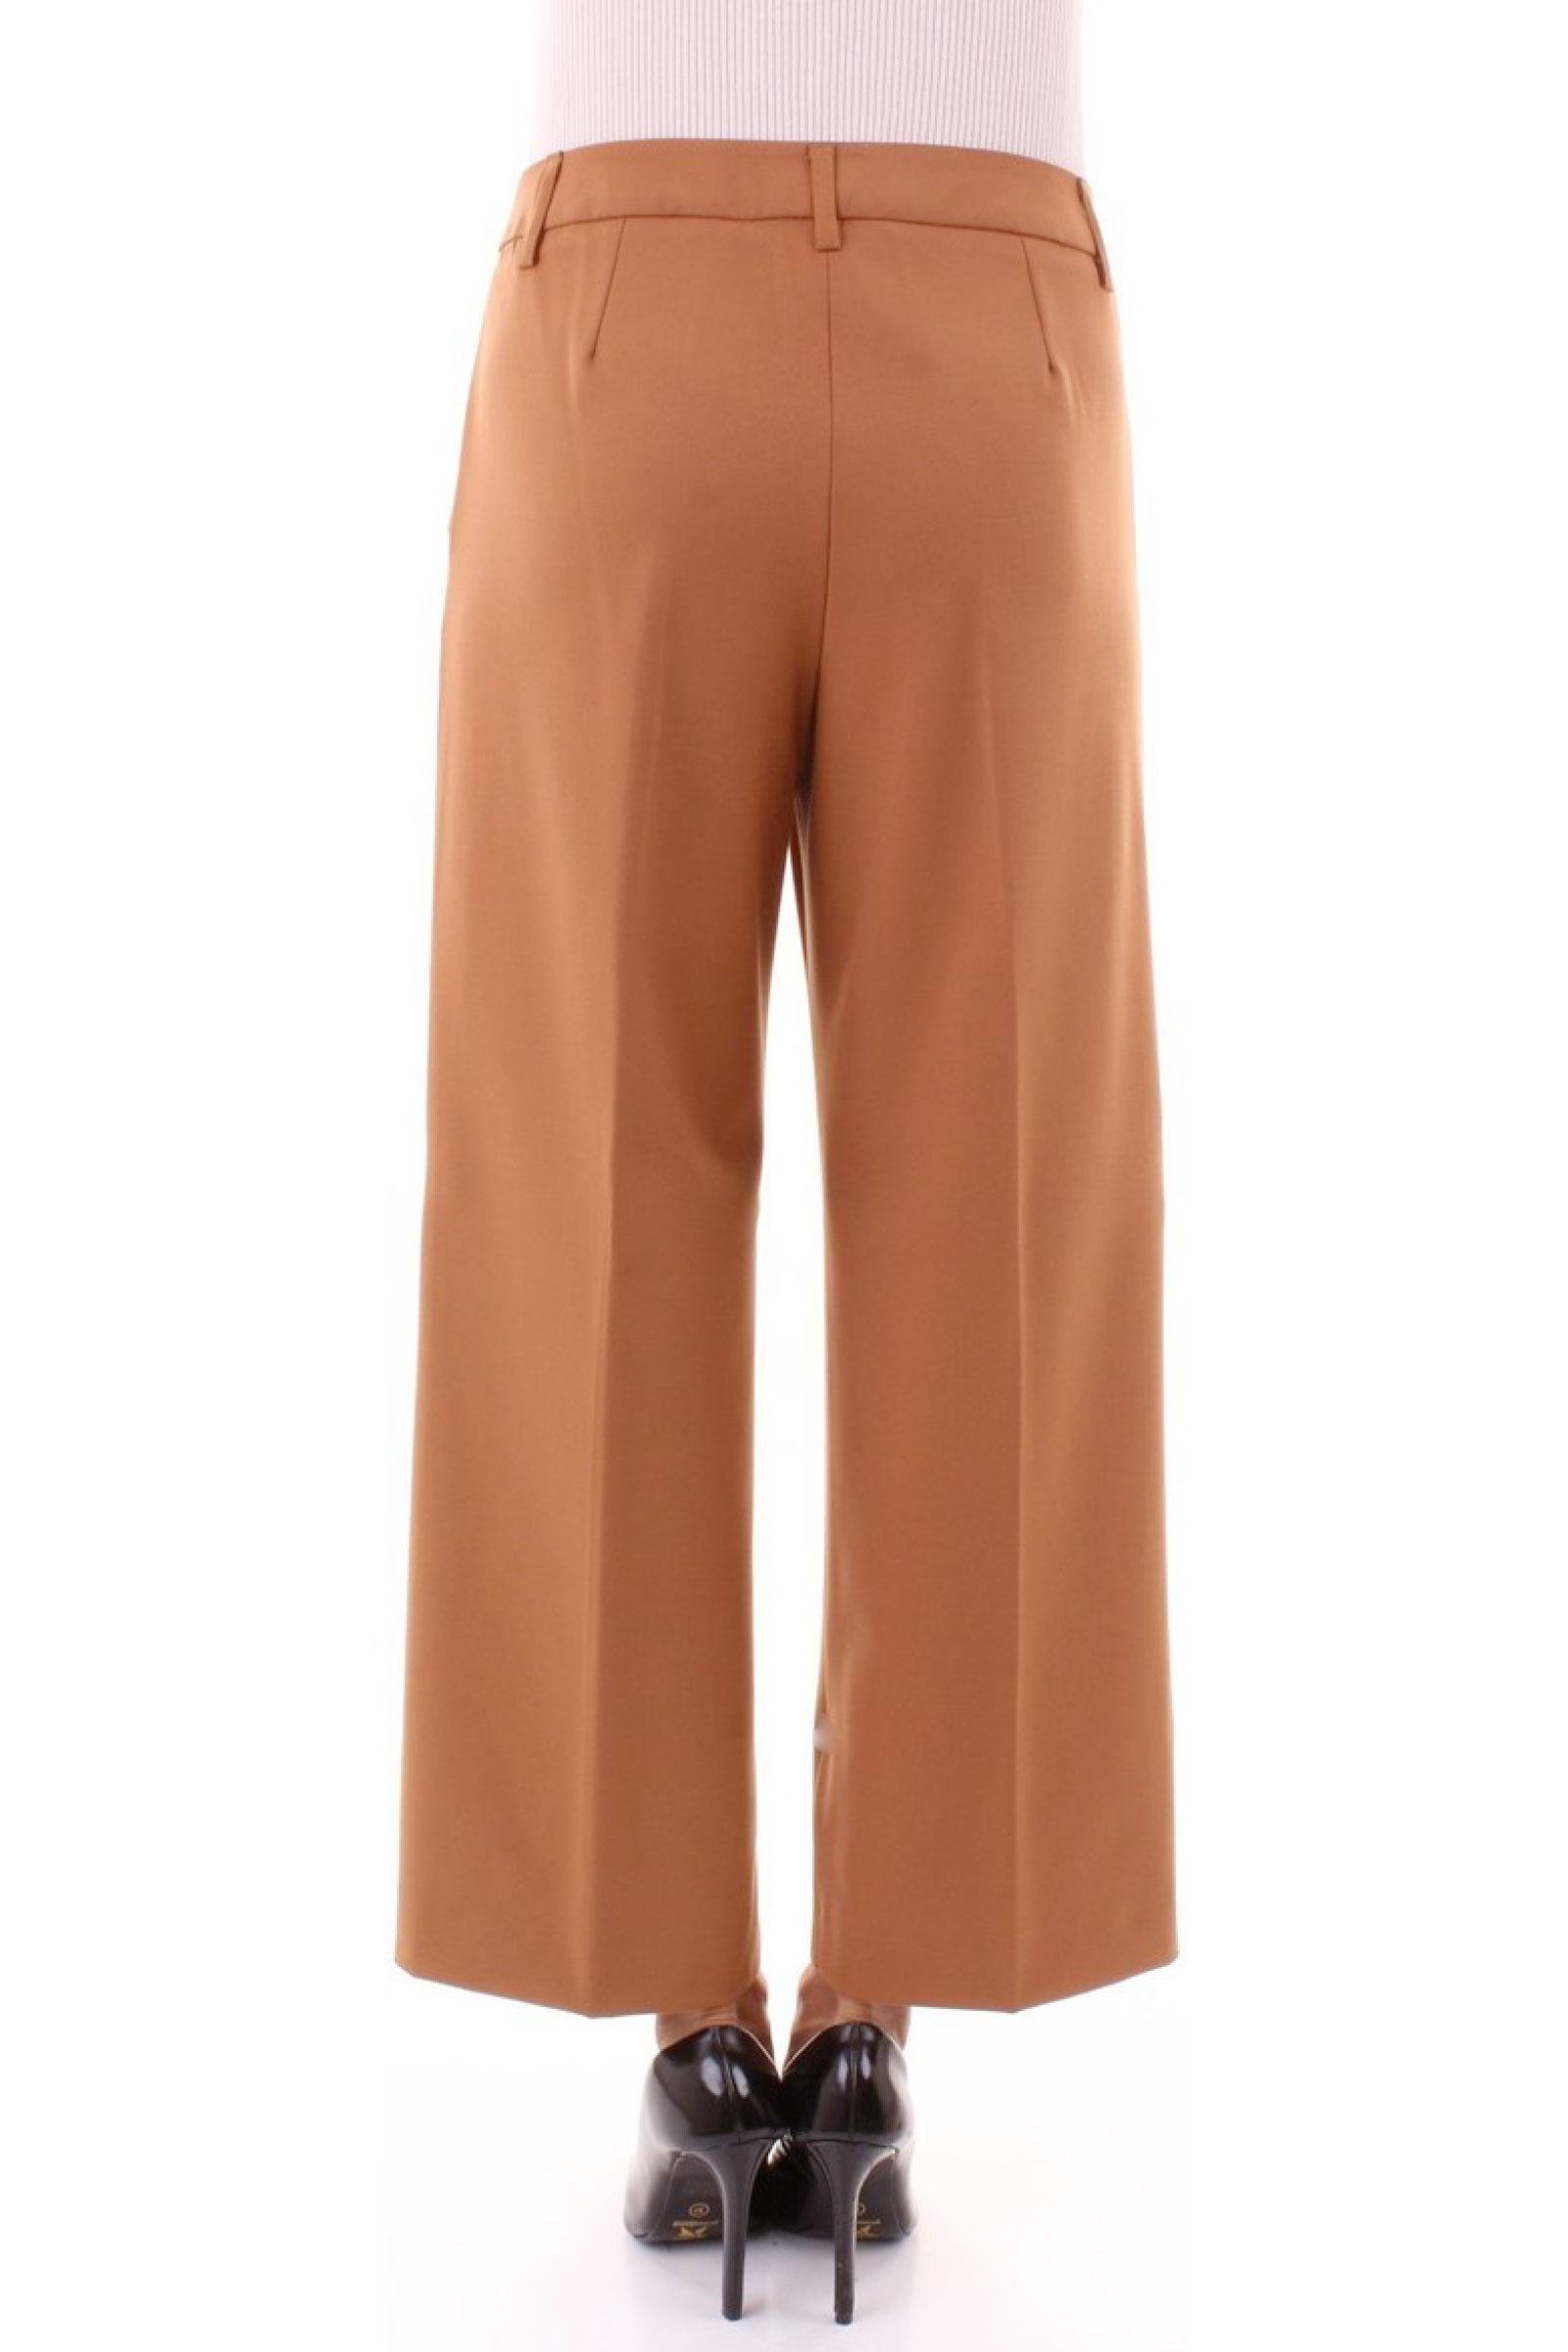 Pantalone Donna Modello ILSA EMME MARELLA   Pantalone   51361018200003